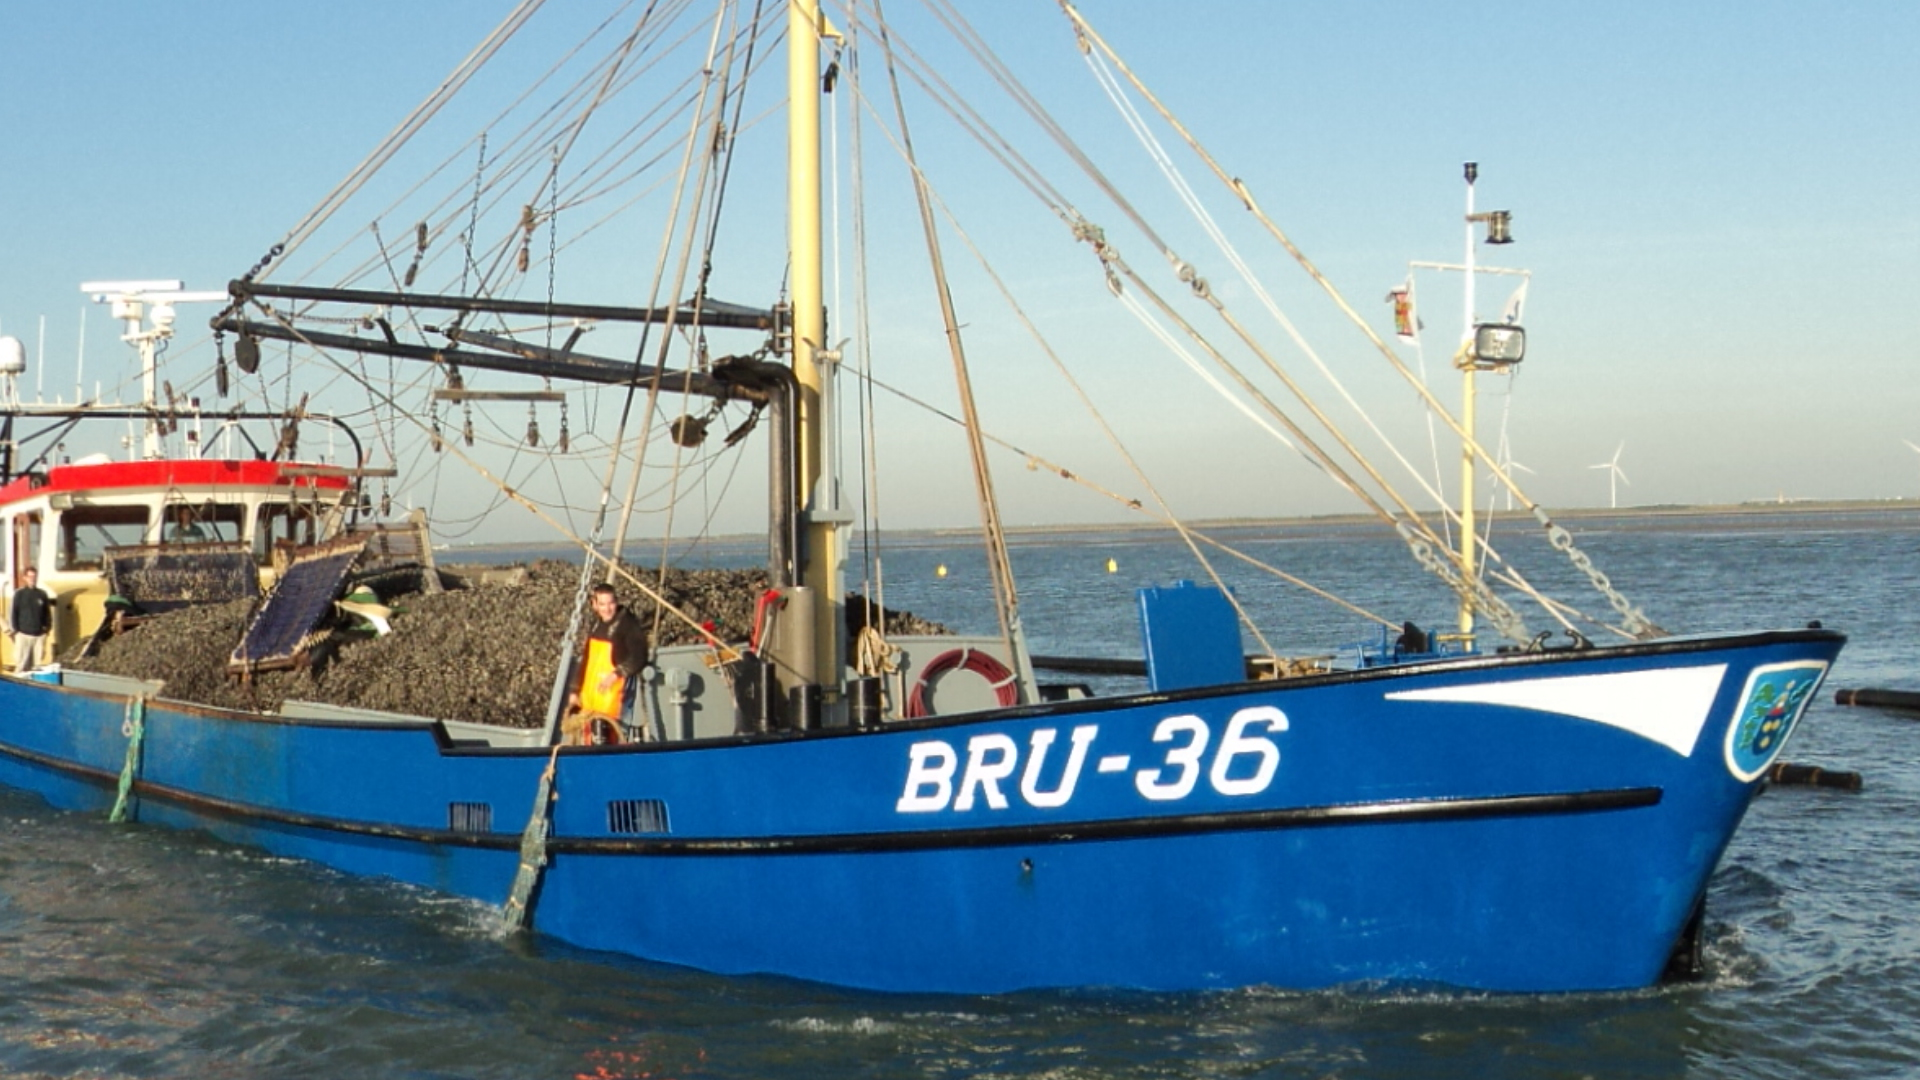 Mosselboot Bruinisse Bru-36